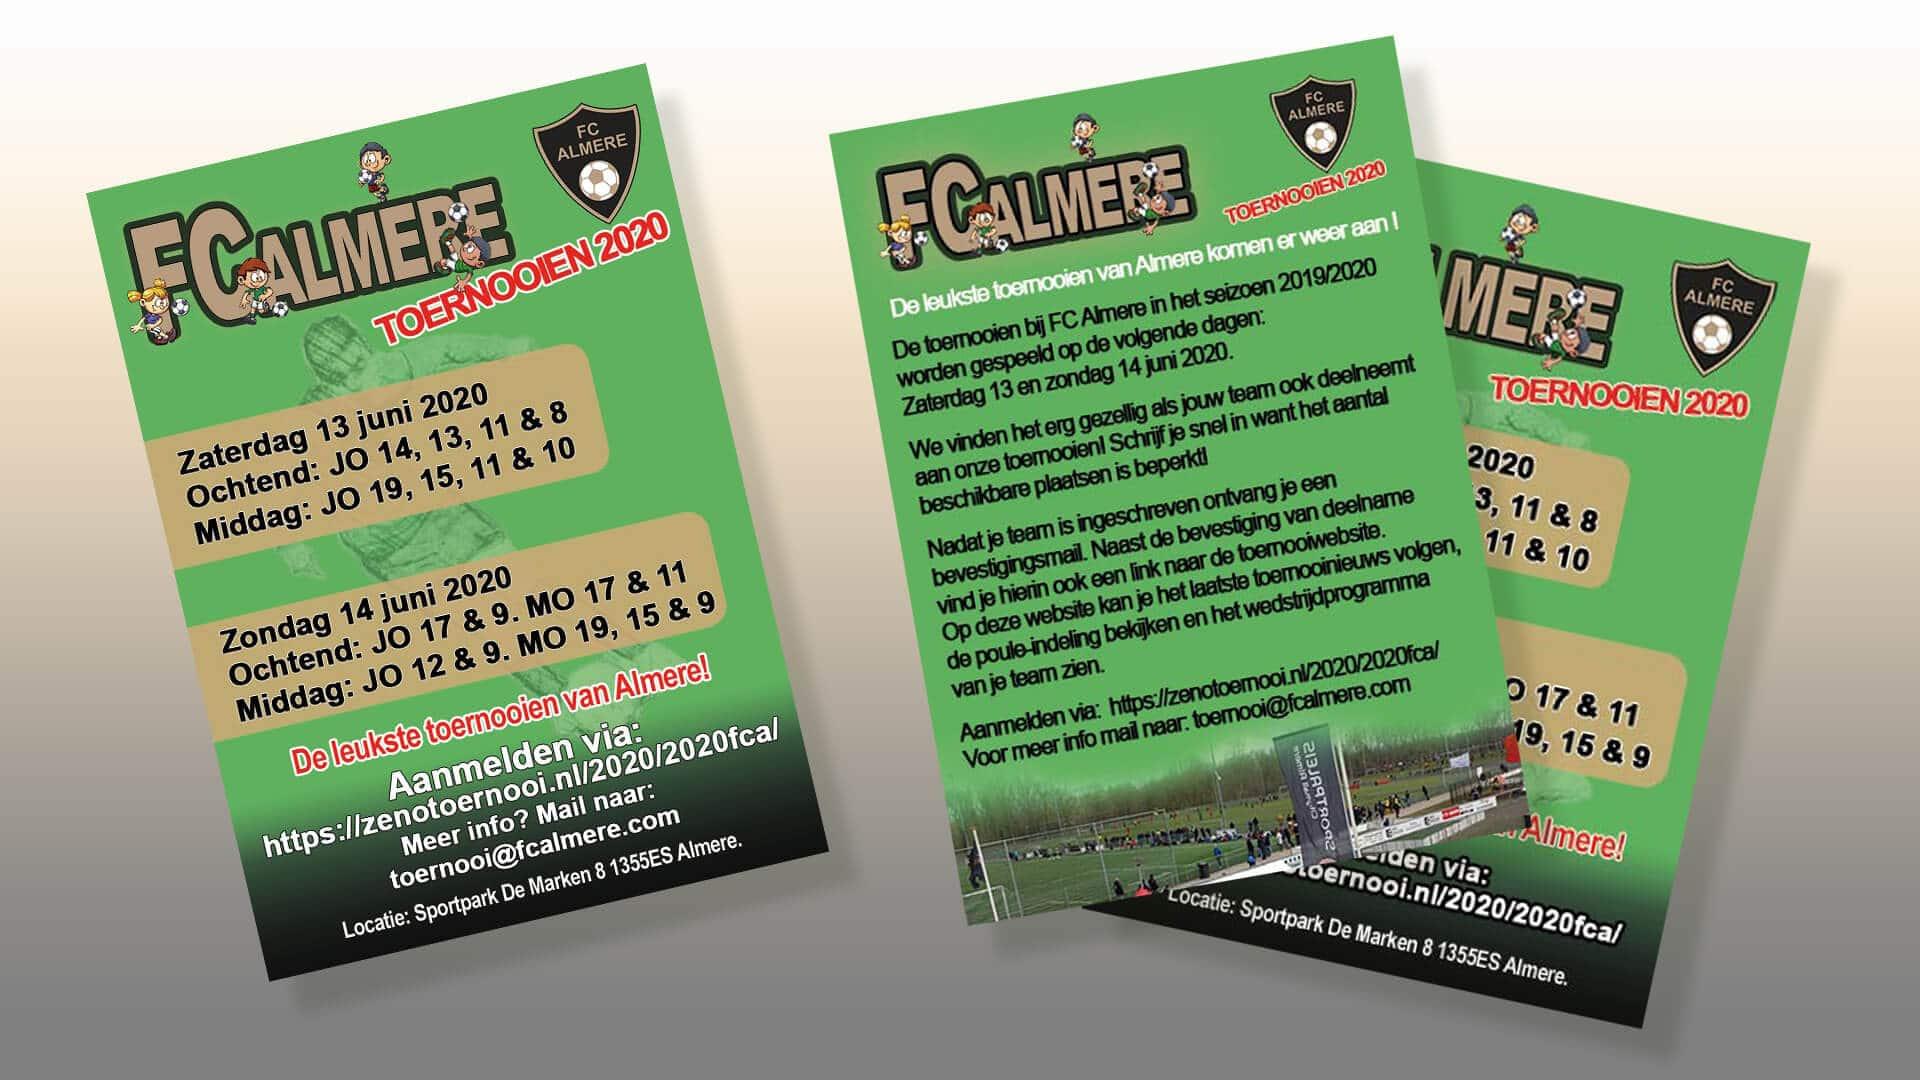 Toernooien FC Almere 2020 - Boxsol promotie materiaal